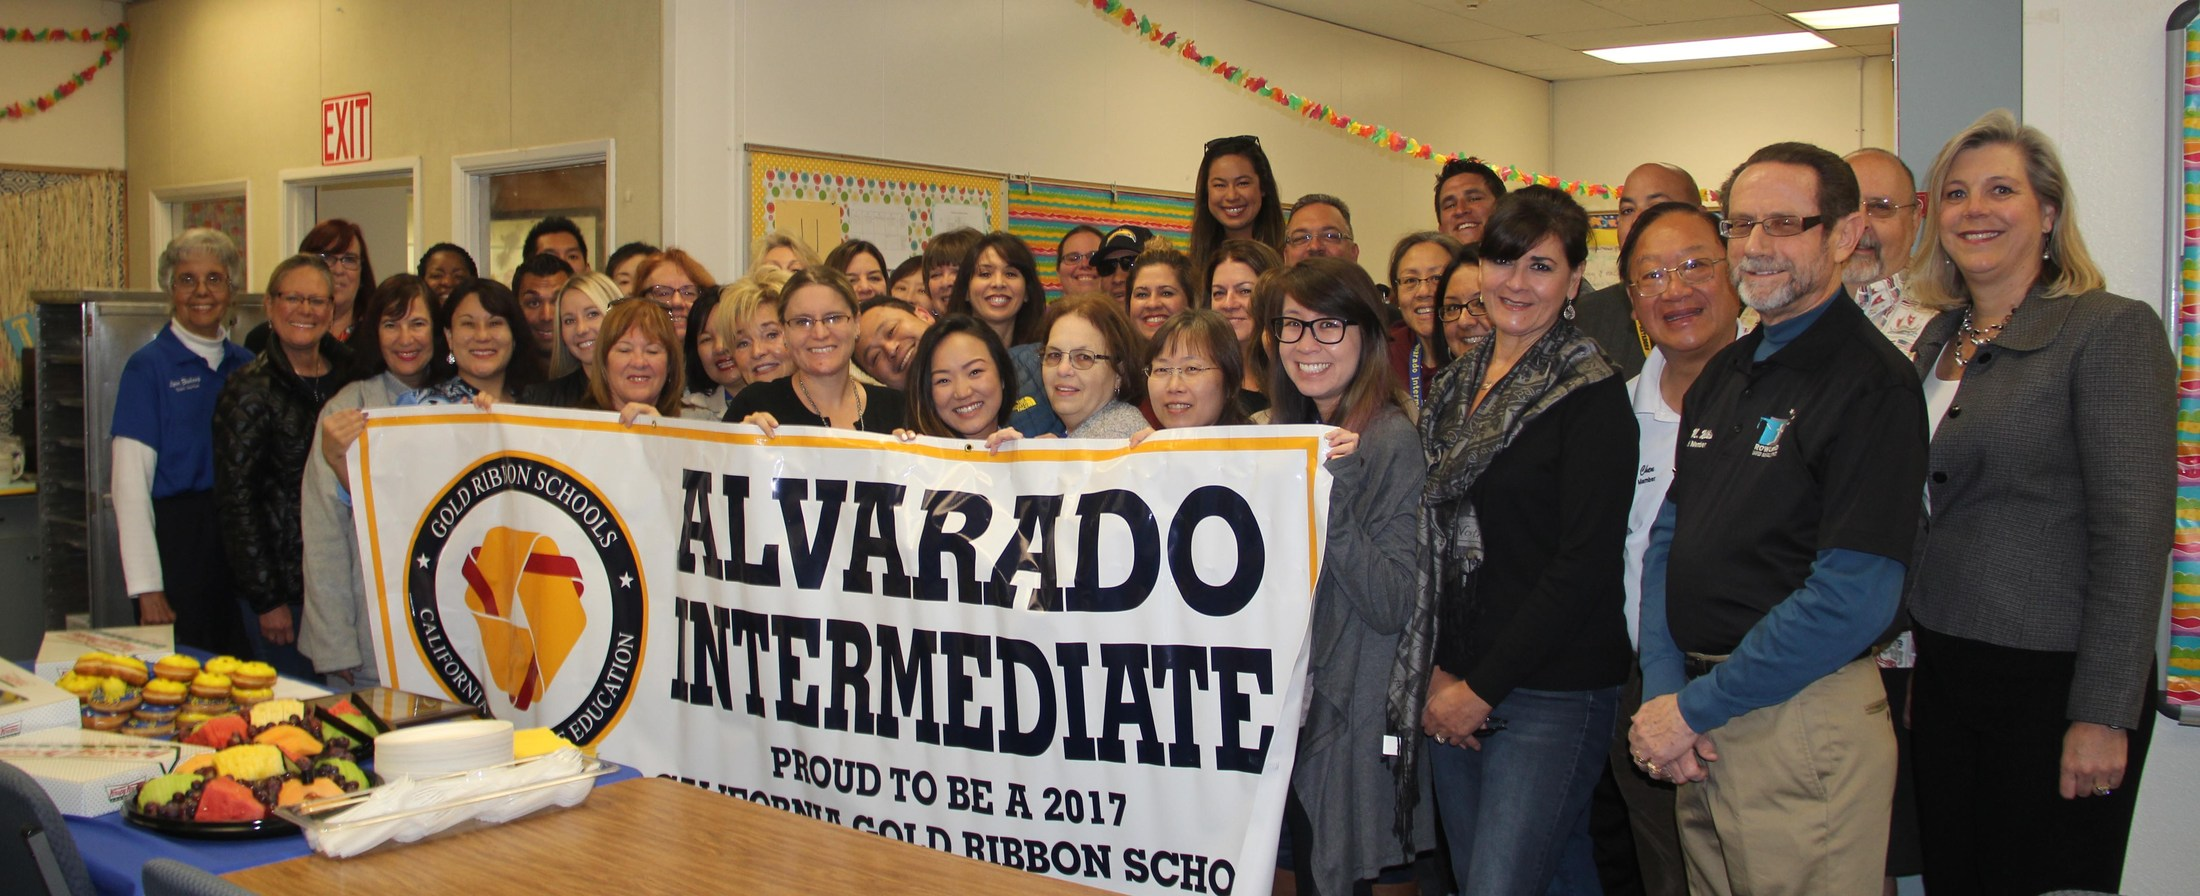 Alvarado Staff